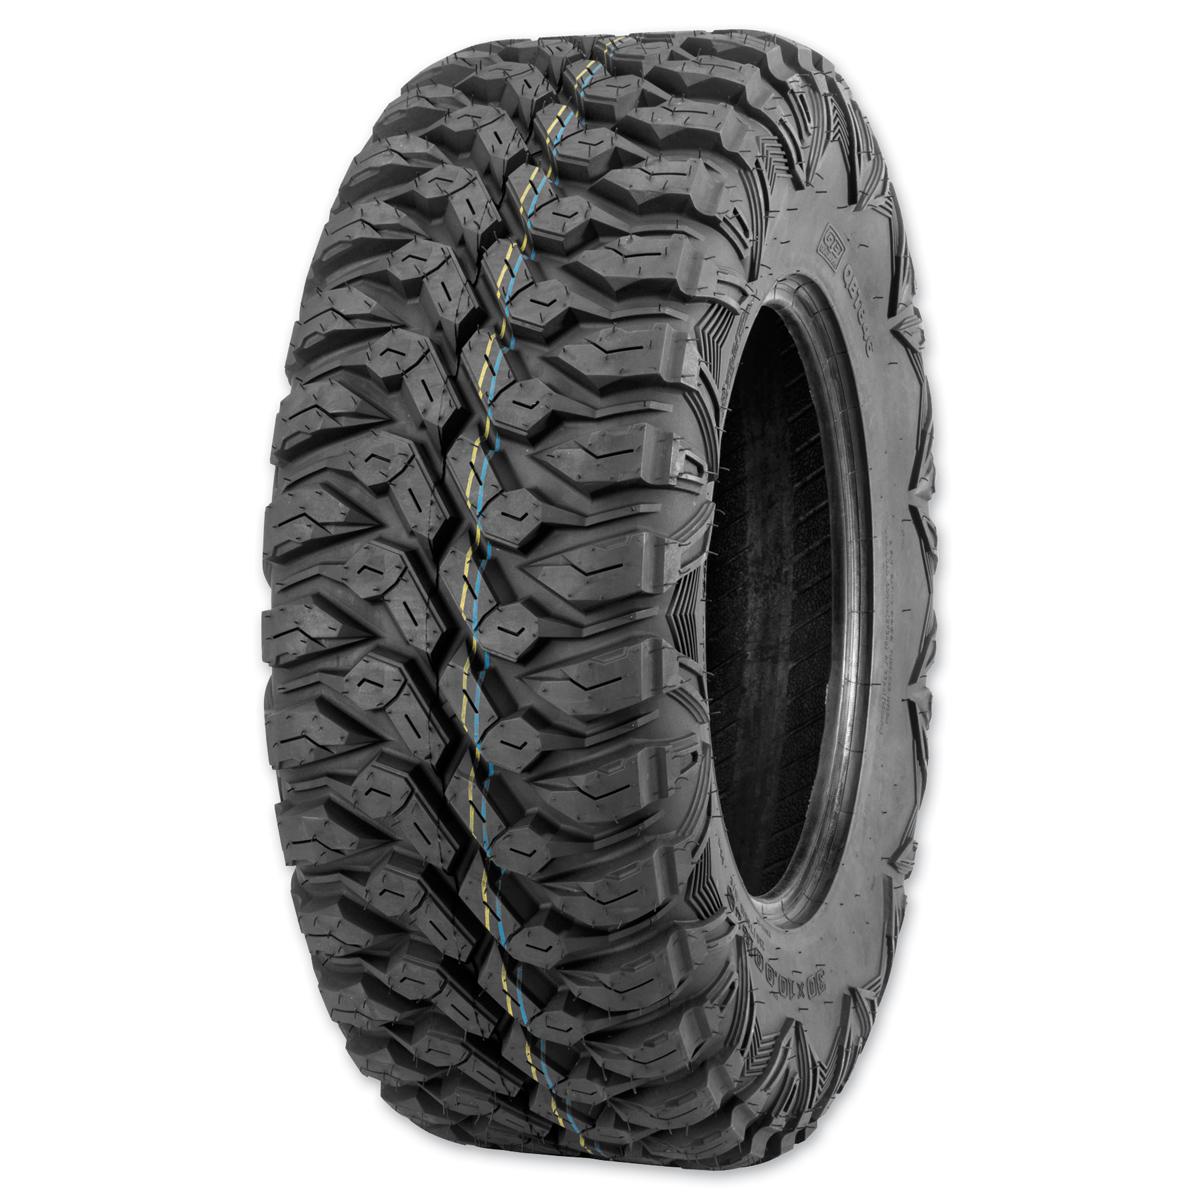 Quadboss QBT846 27X9R-14 8-Ply Front Tire